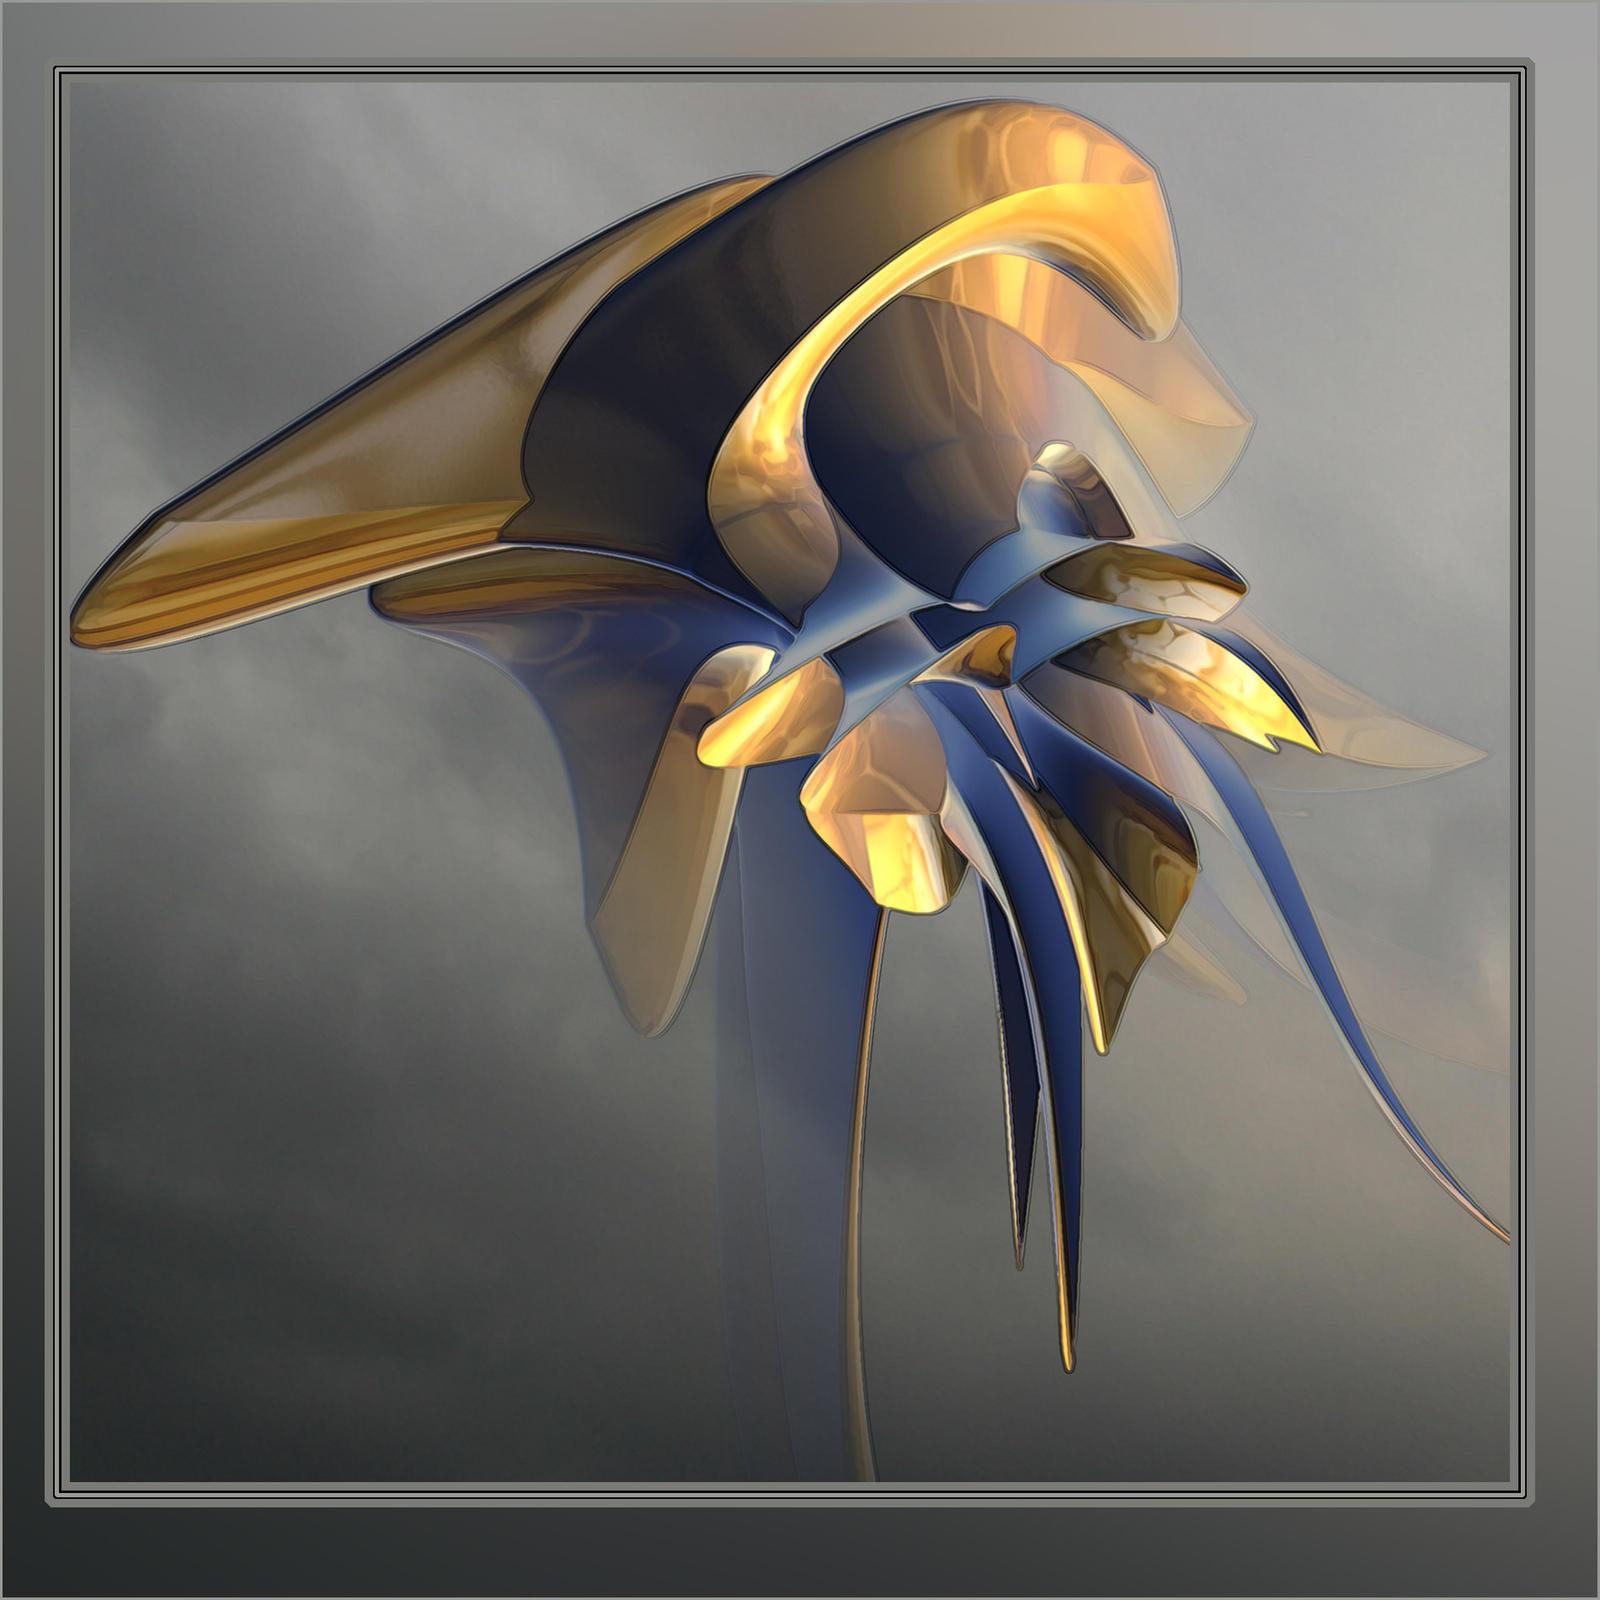 Dreamcatcher by GLO-HE